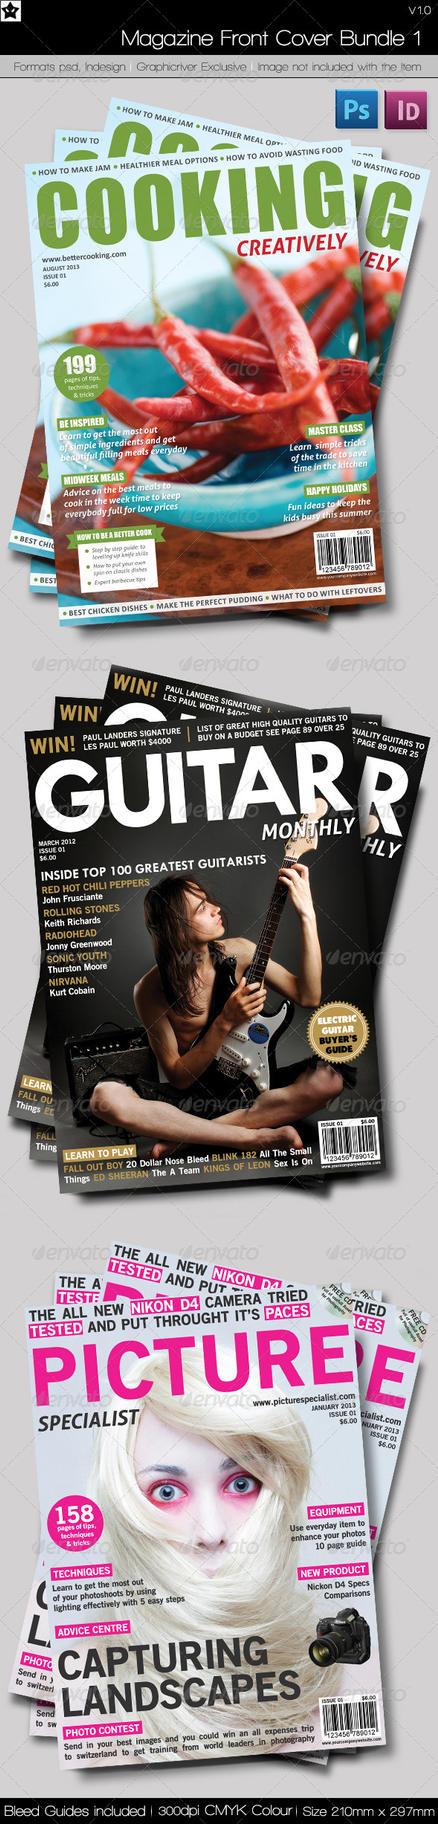 Magazine Front Cover Bundle 1 by HollowIchigoBanki